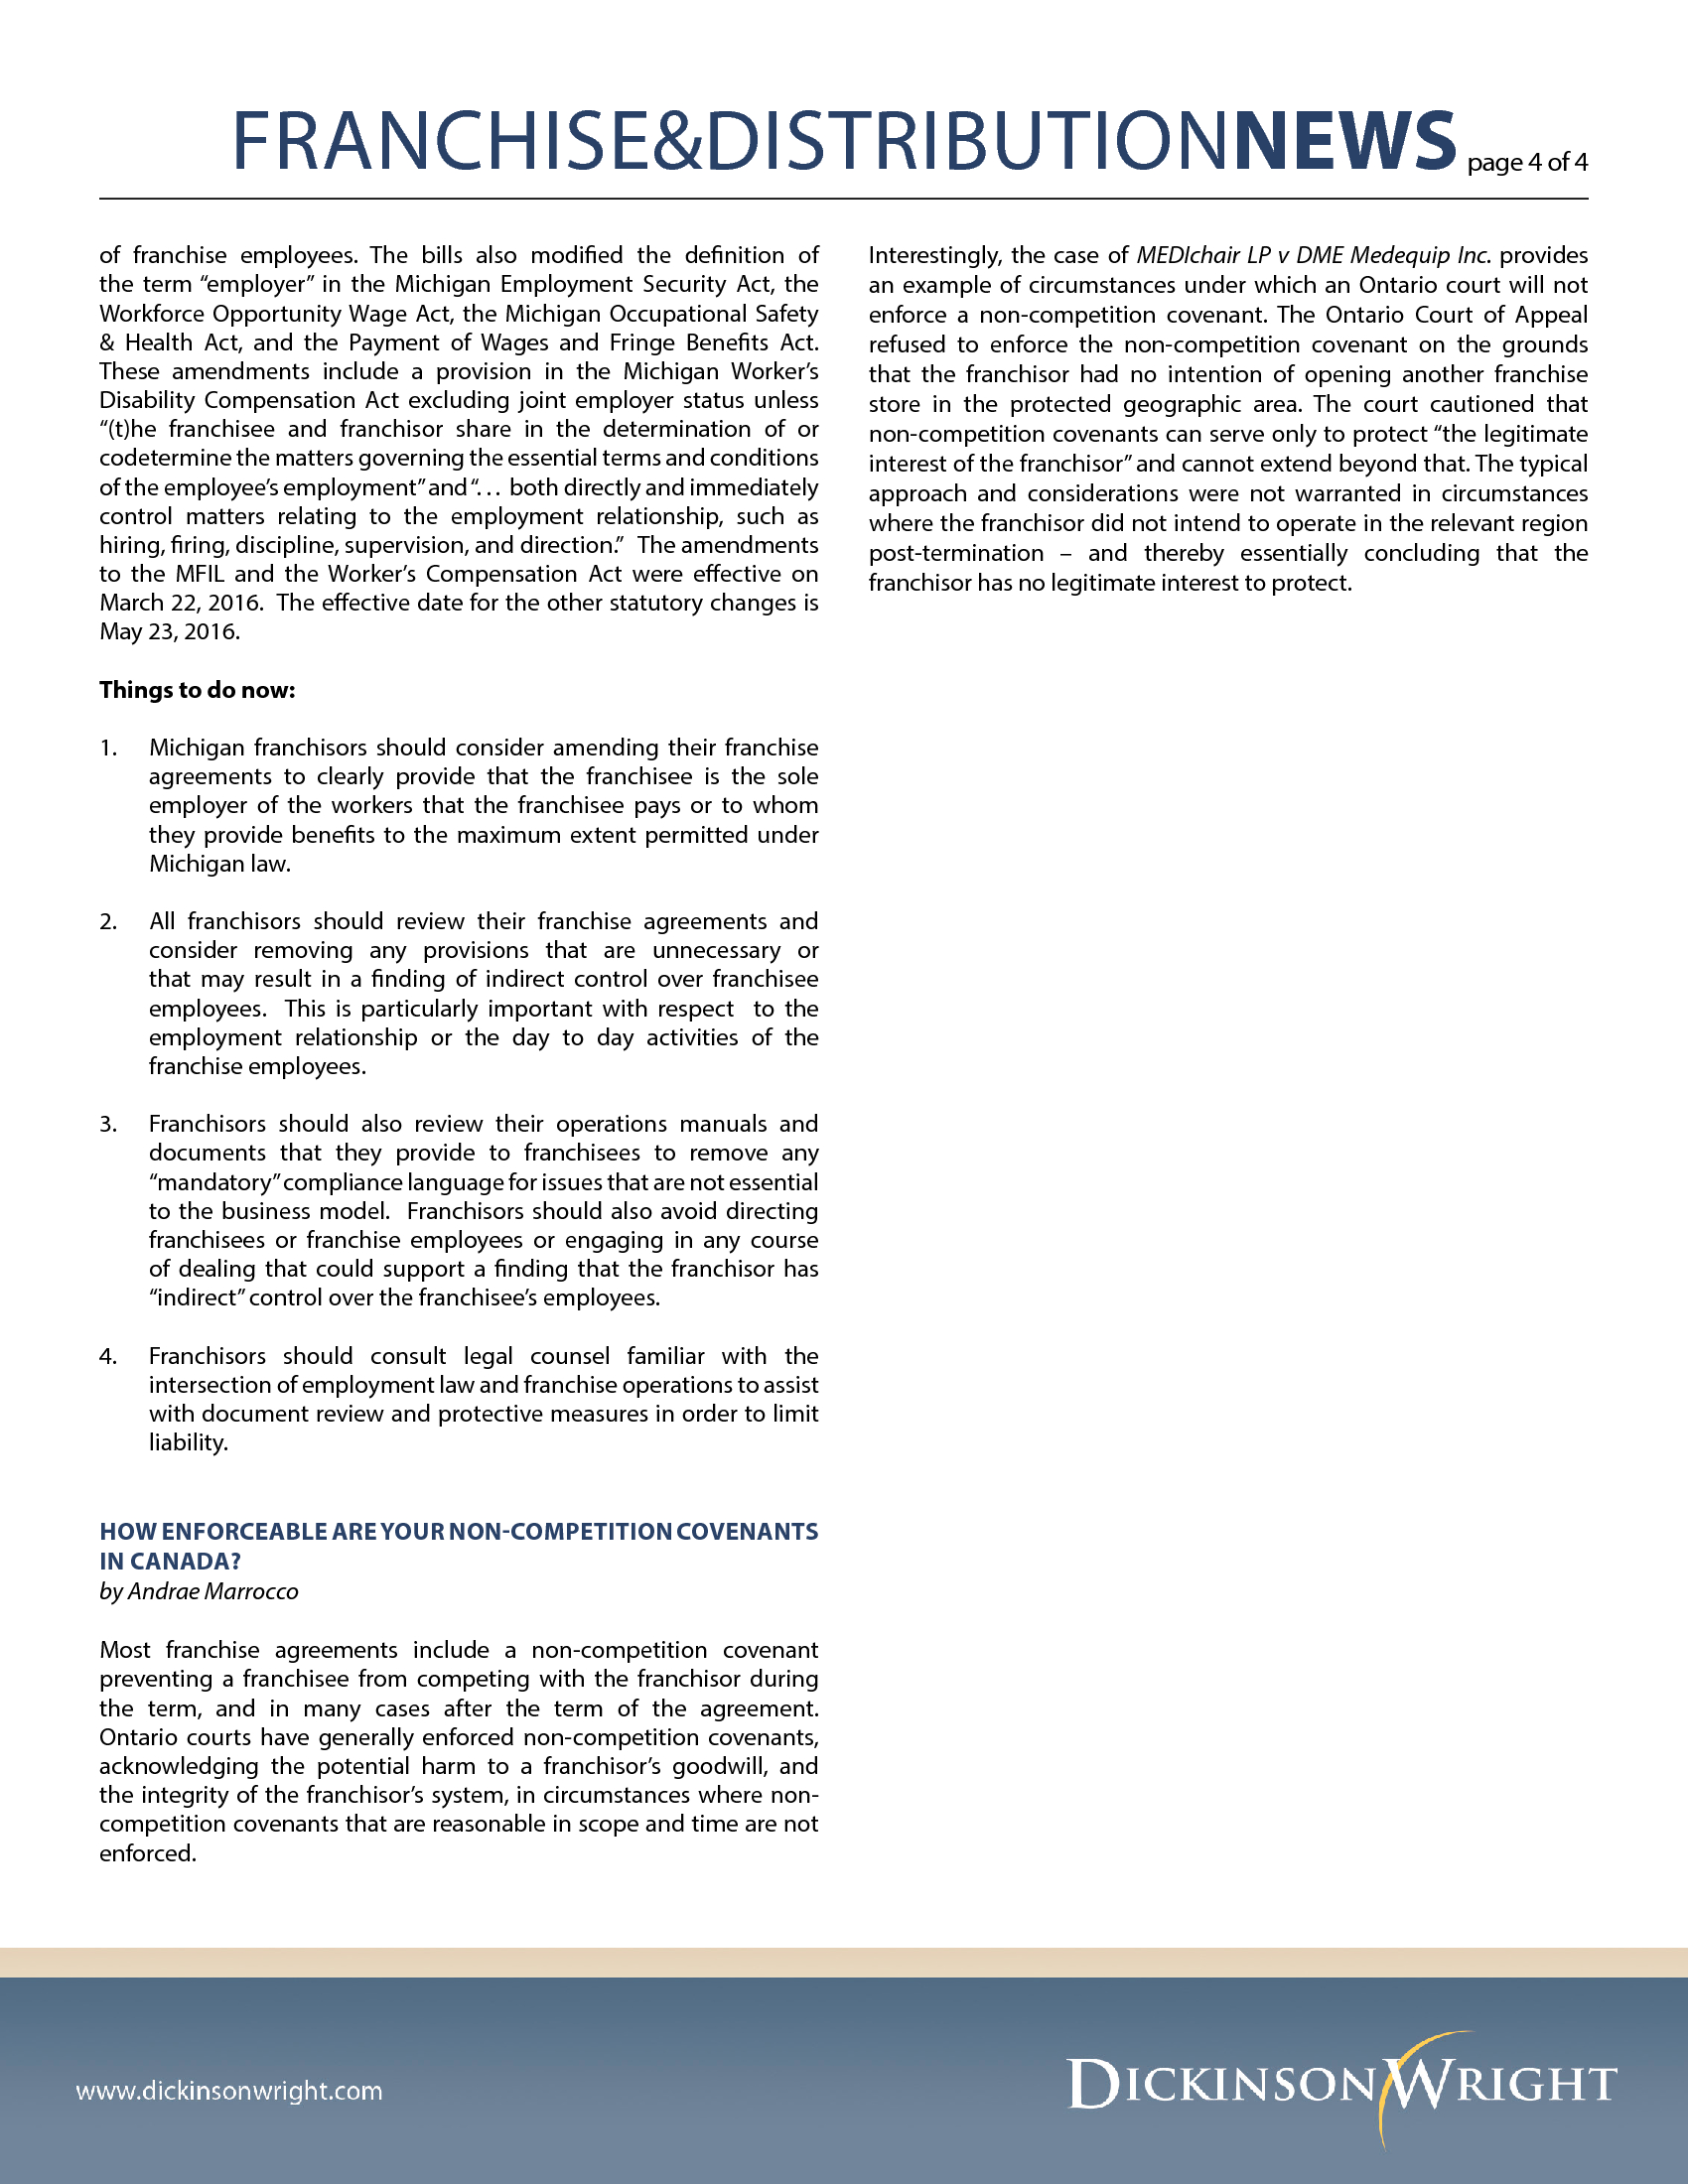 Advisorselect Franchise Distribution News Number 2 April 2016